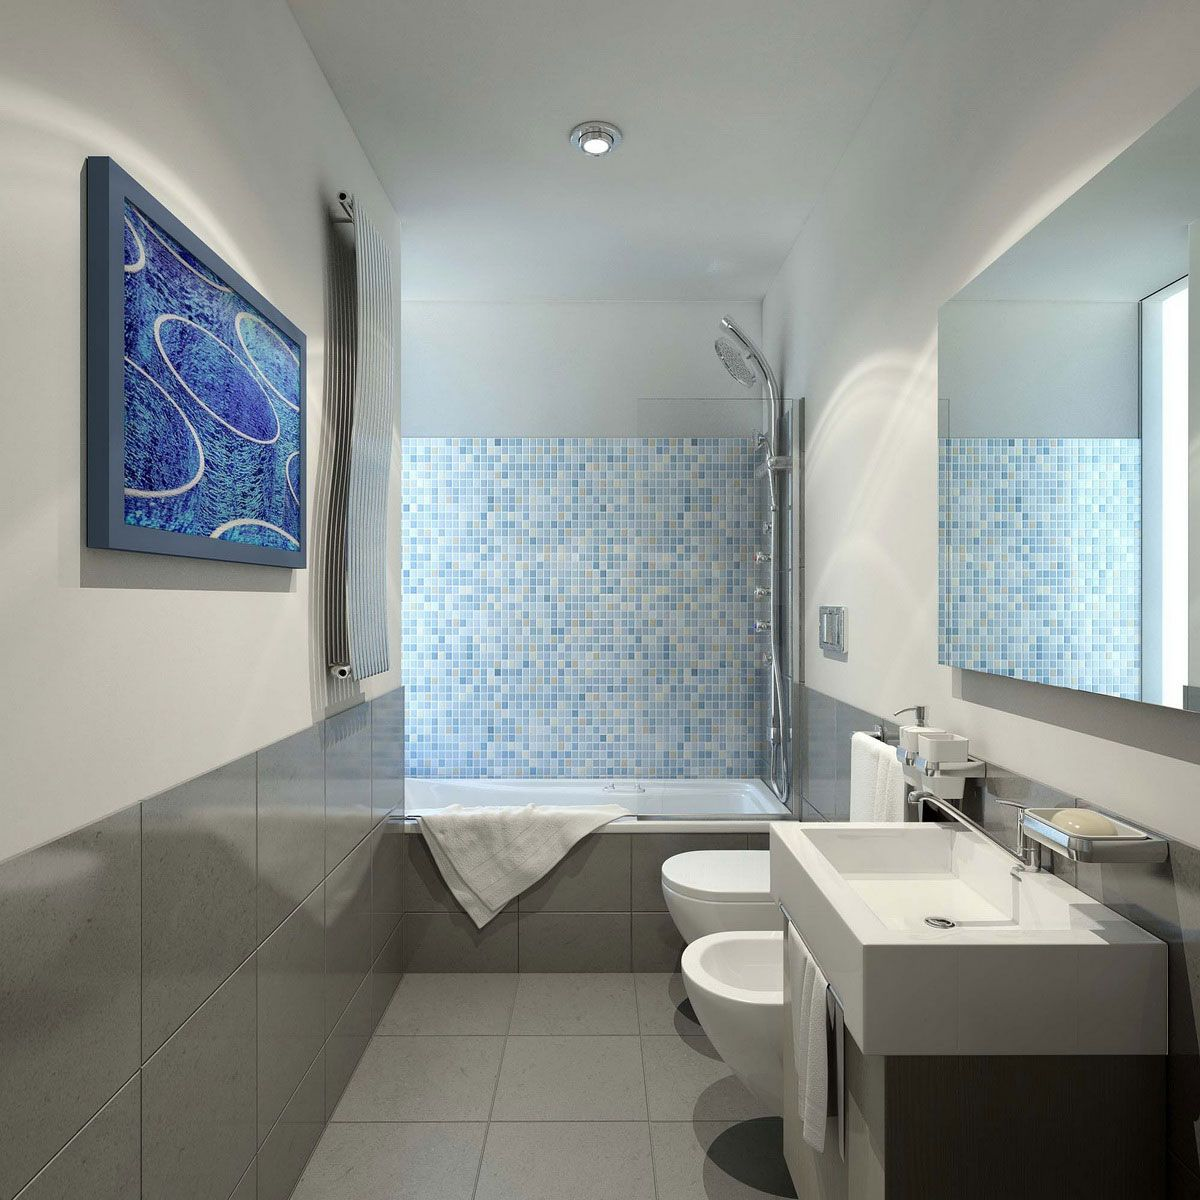 25 bathroom design ideas with images minuscule salle de - Minuscule salle de bain ...